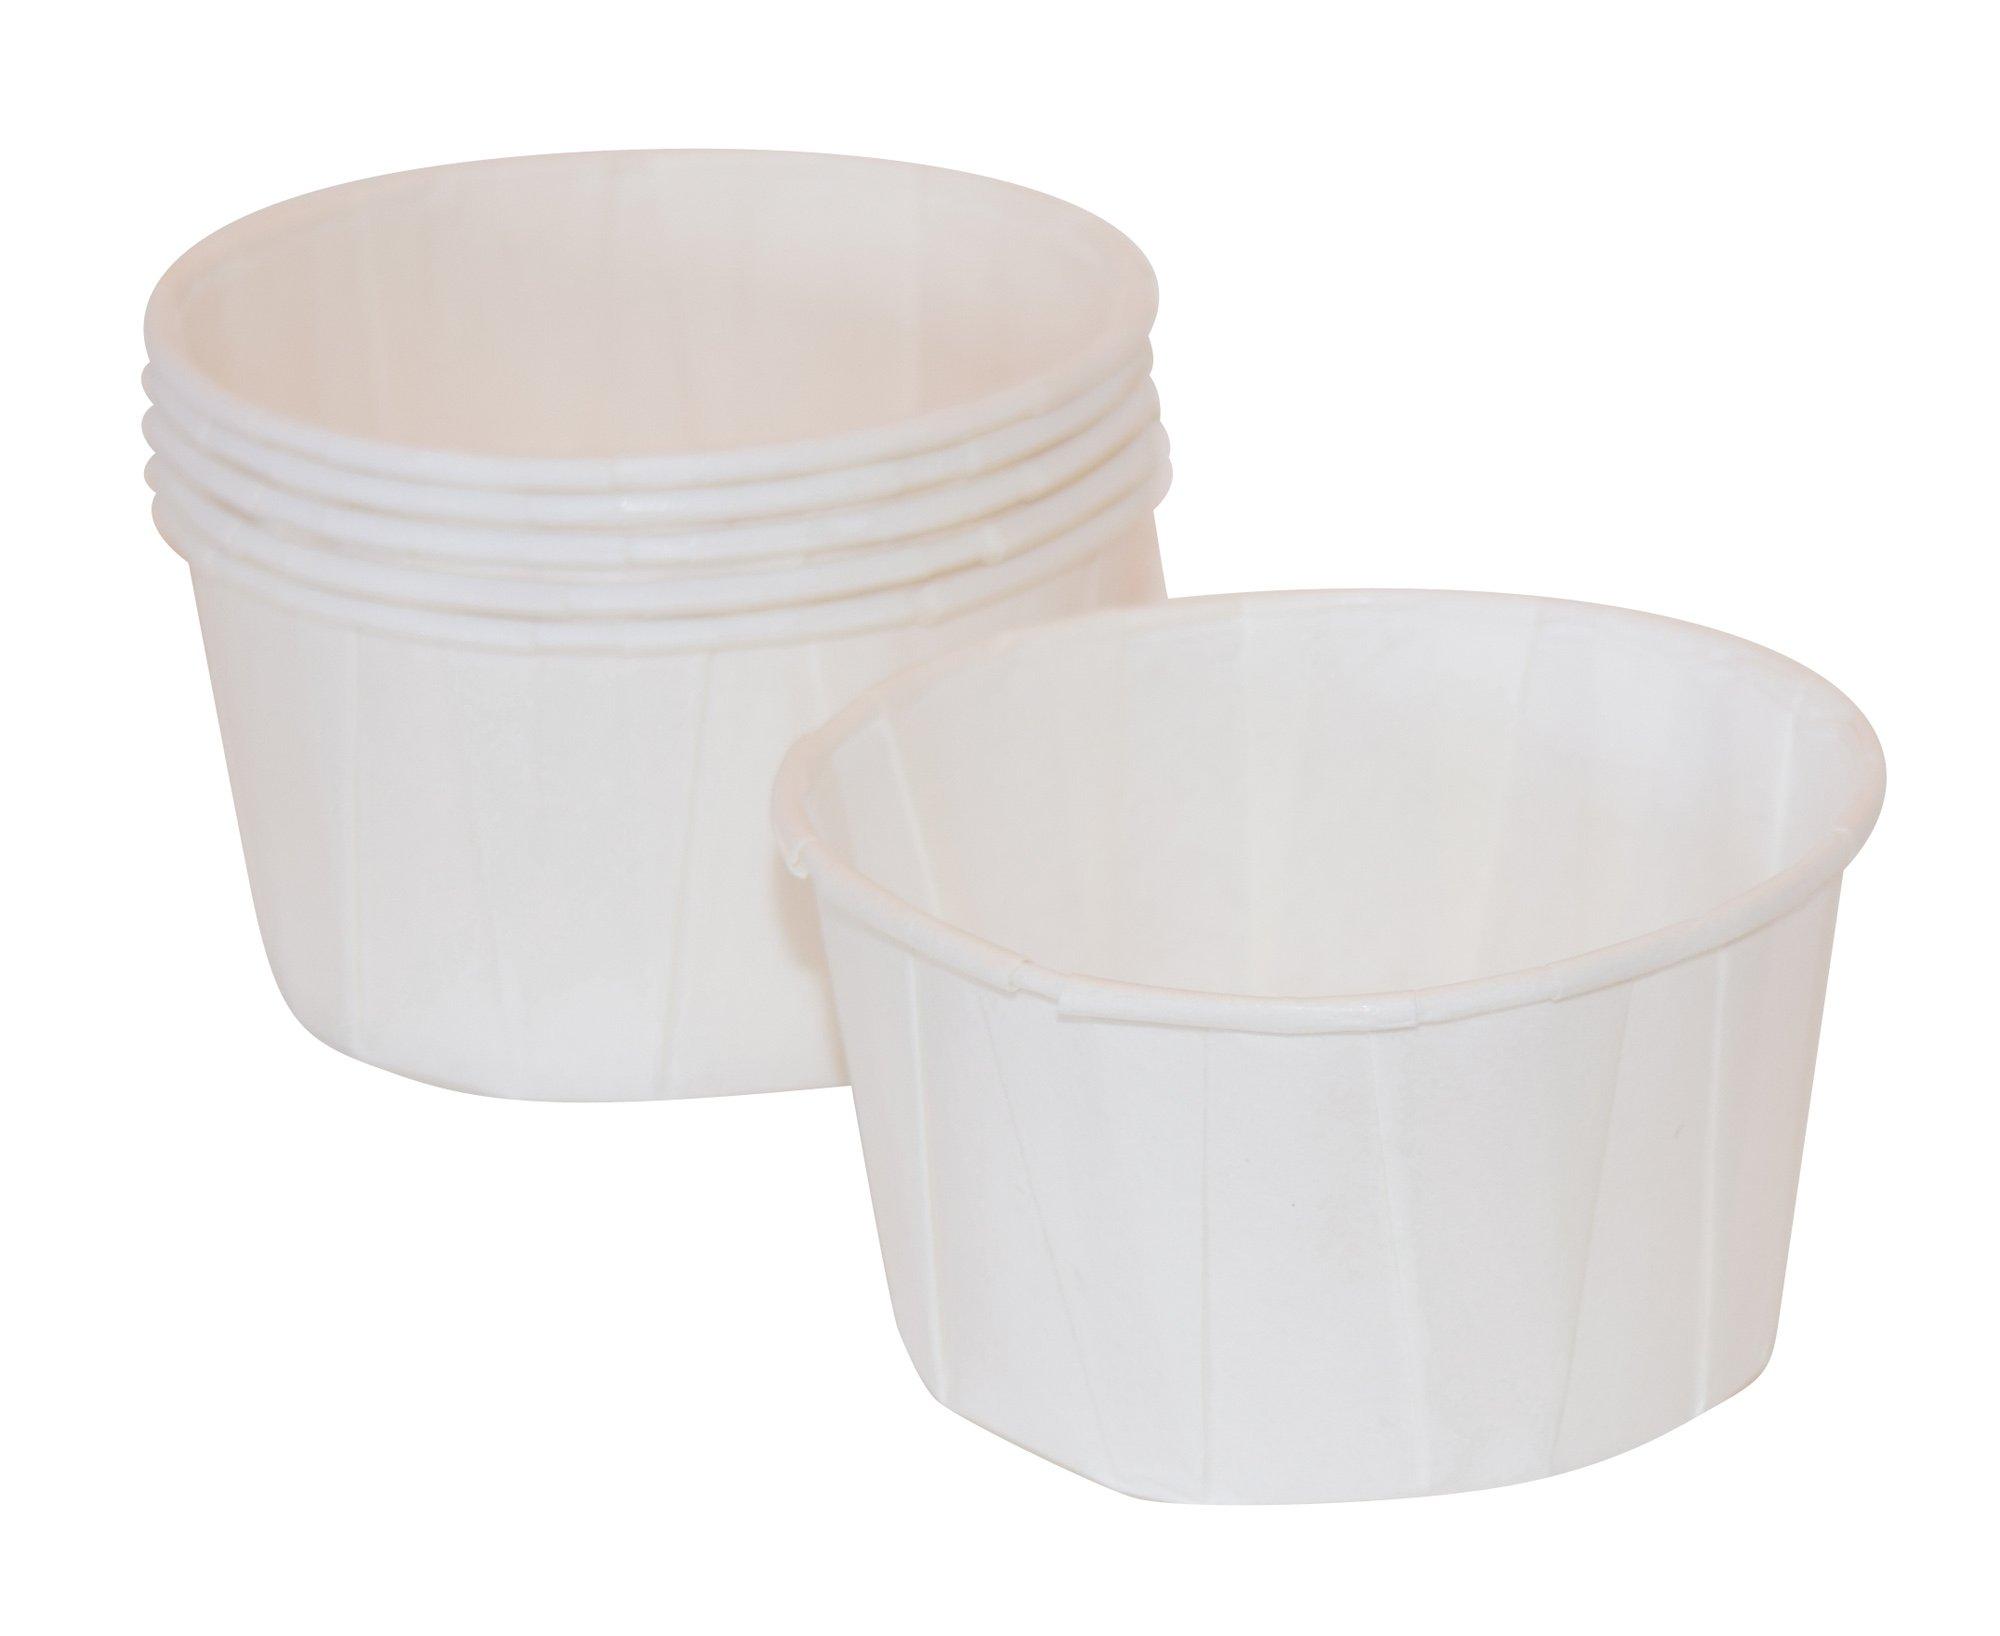 4 oz, Paper Souffle Portion Cups, Value set of 500